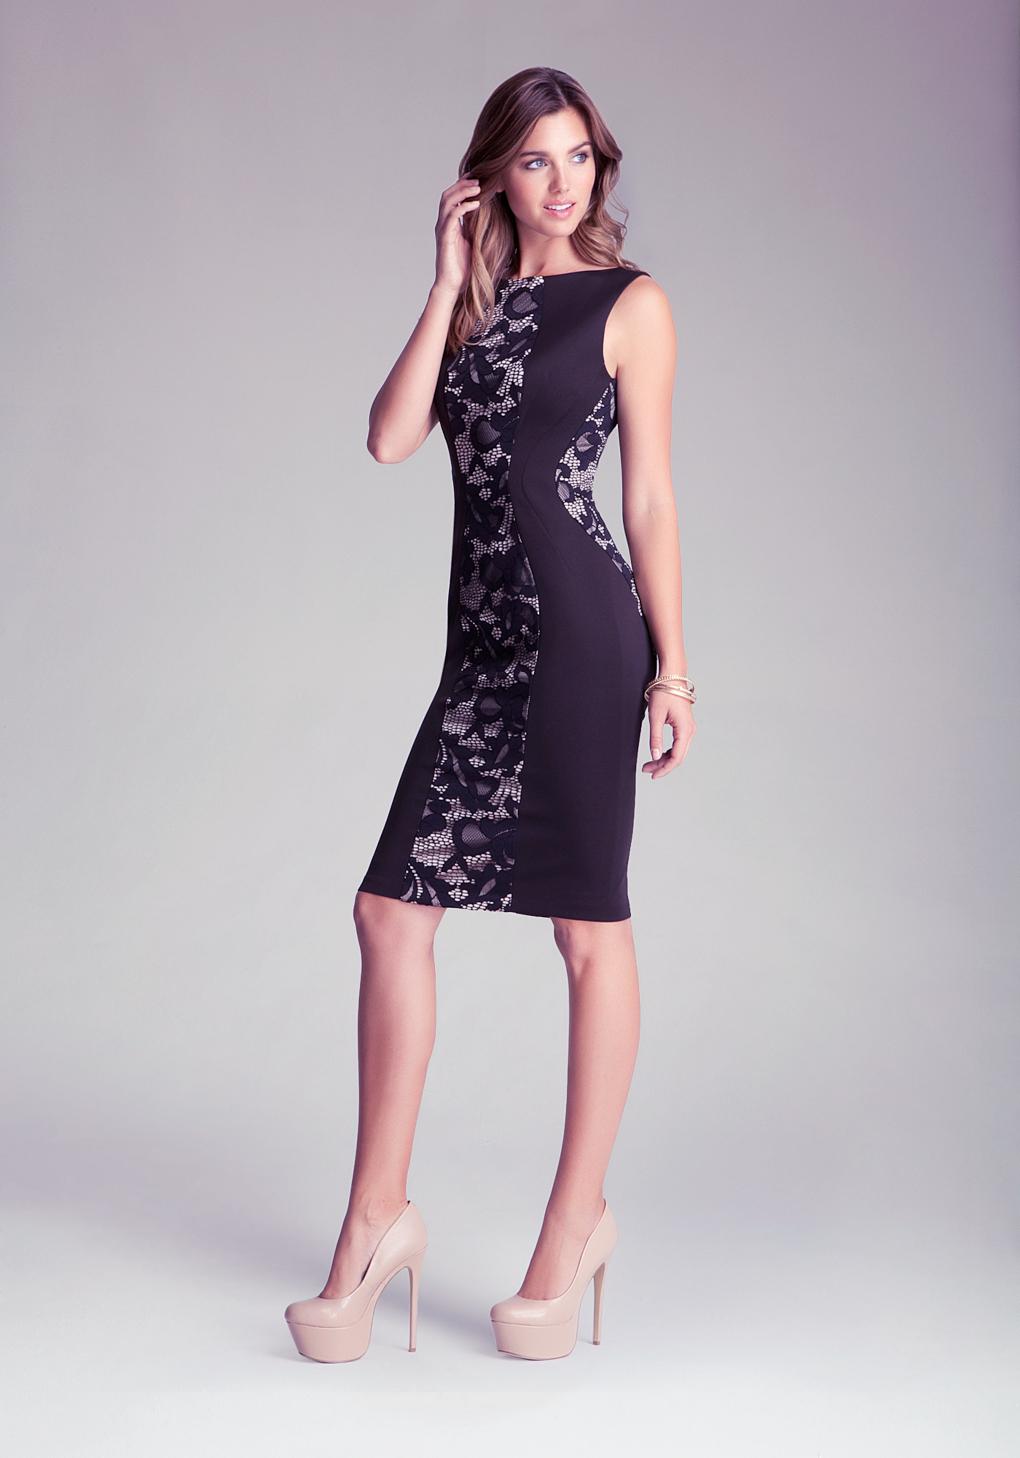 bebe lace ponte midi dress in black lyst. Black Bedroom Furniture Sets. Home Design Ideas